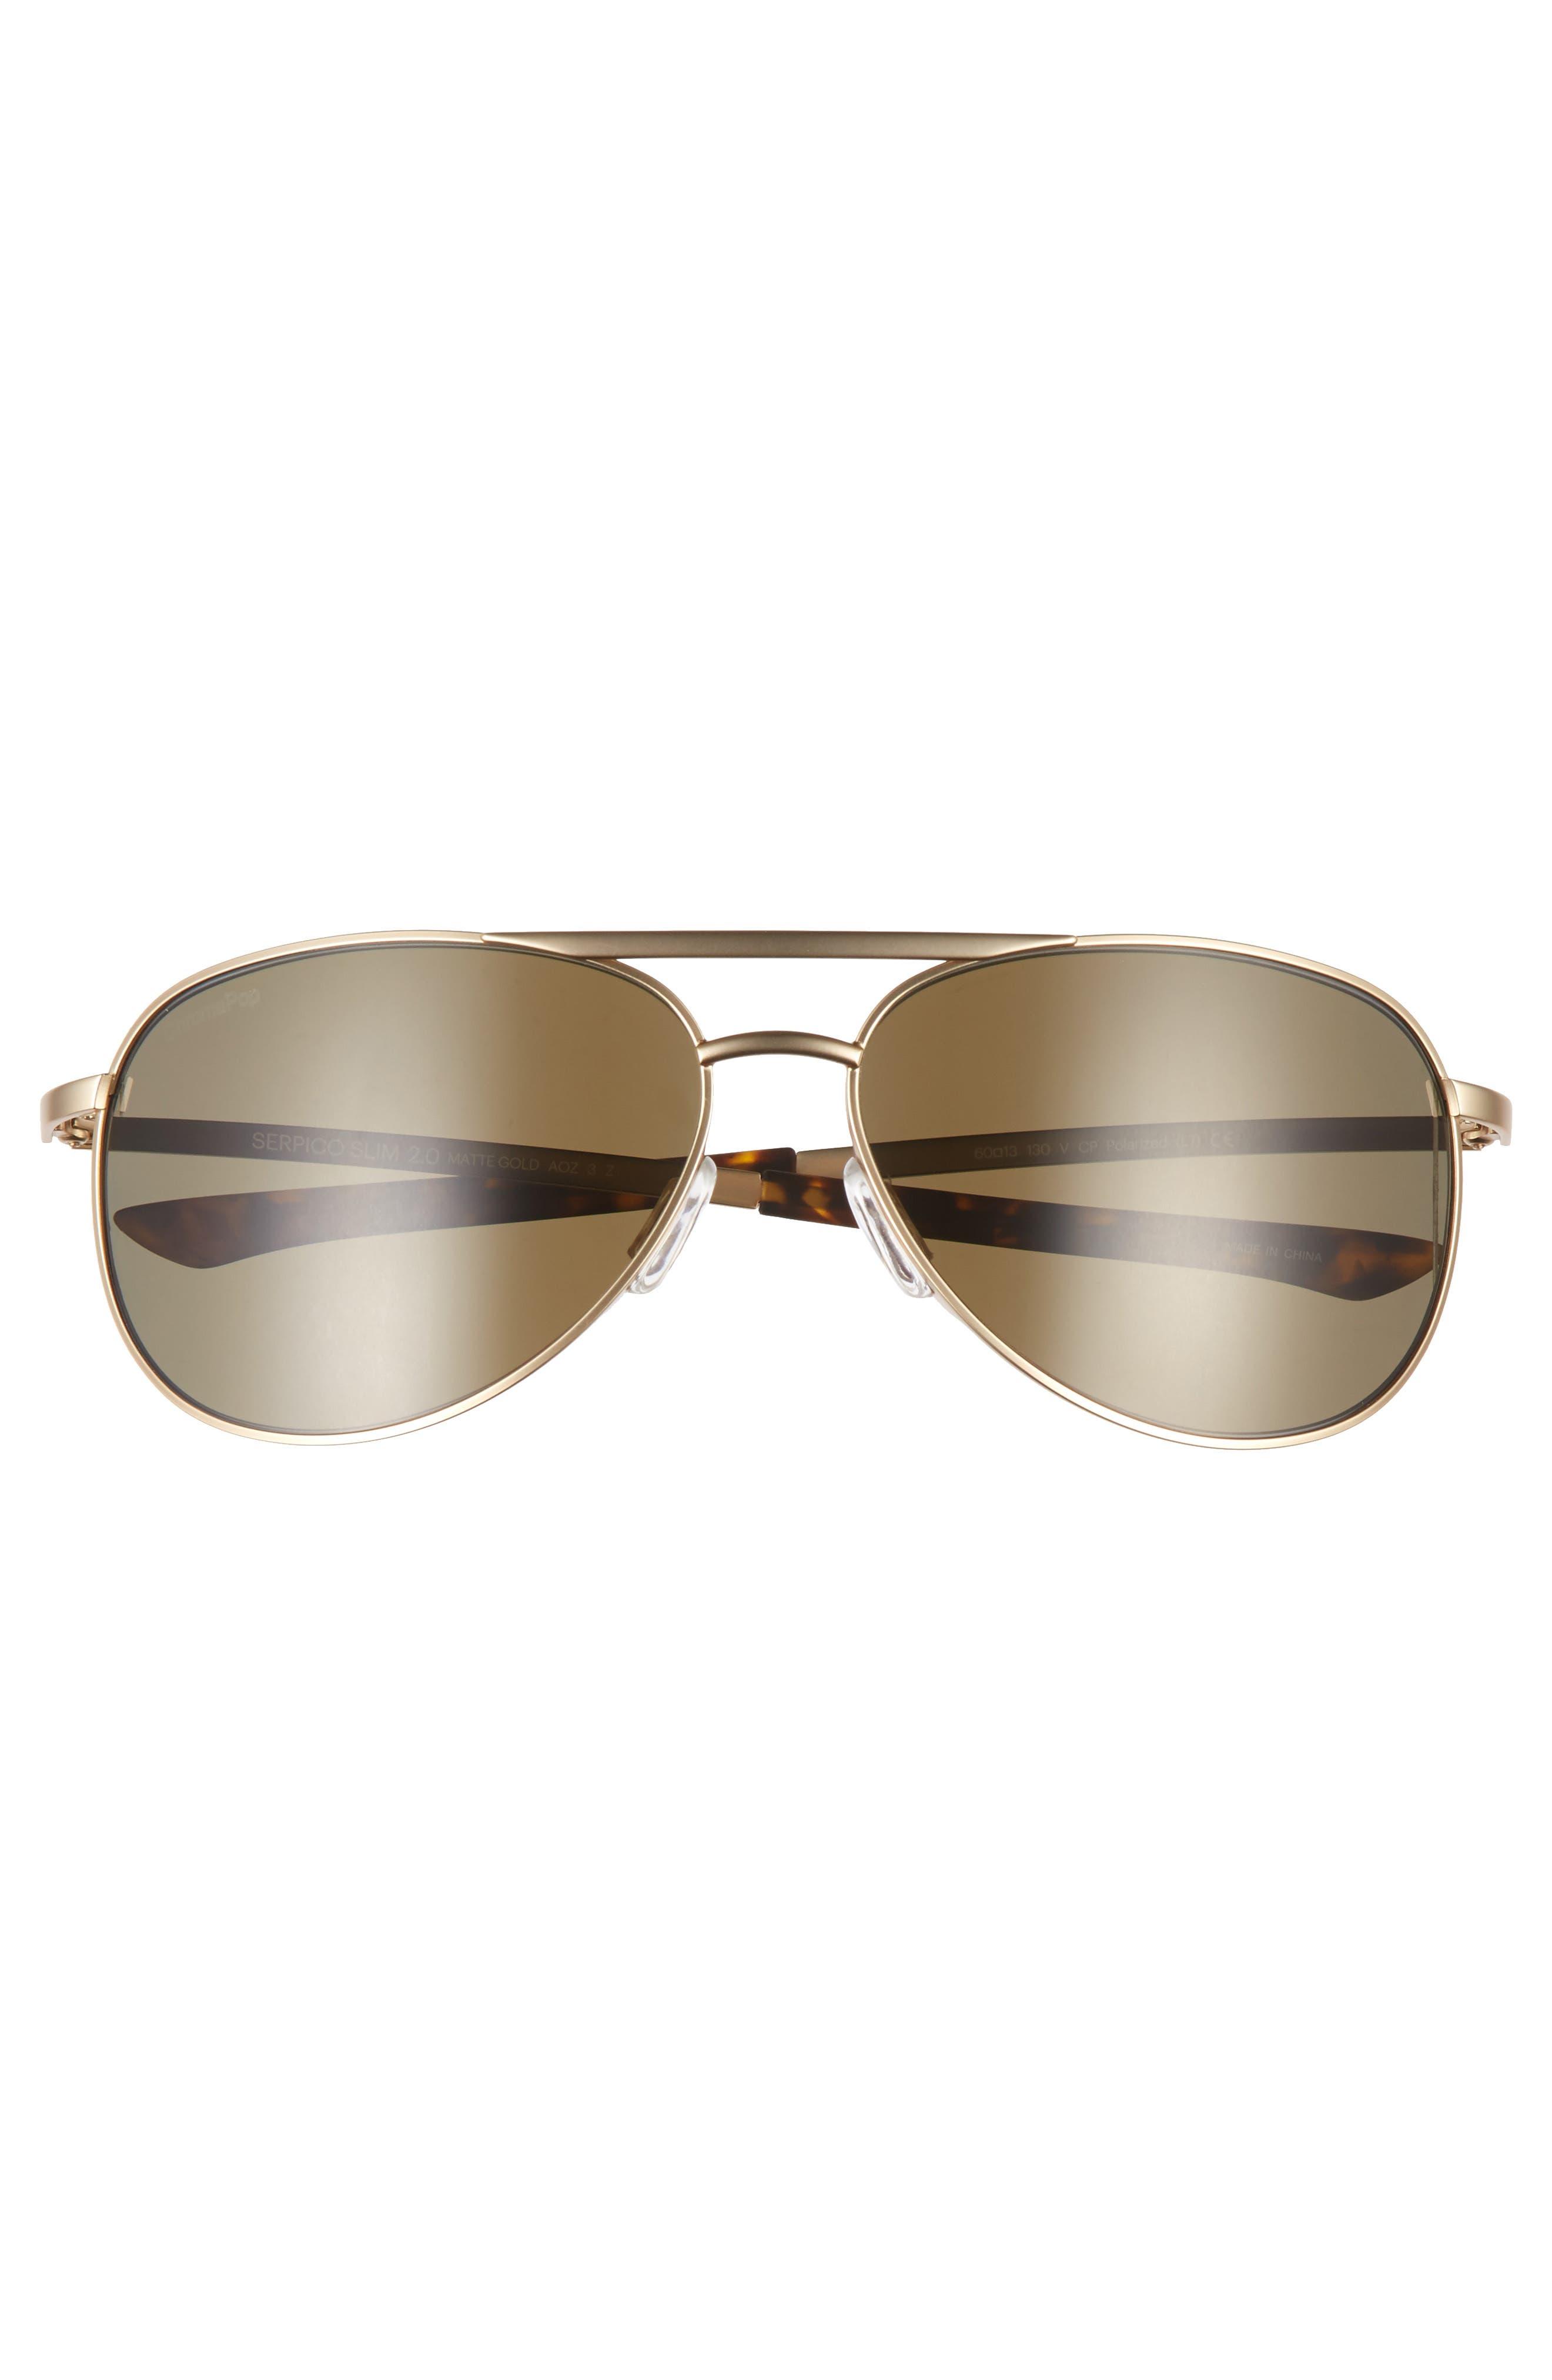 Serpico Slim 2.0 60mm ChromaPop Polarized Aviator Sunglasses,                             Alternate thumbnail 3, color,                             Gold/ Brown Polar